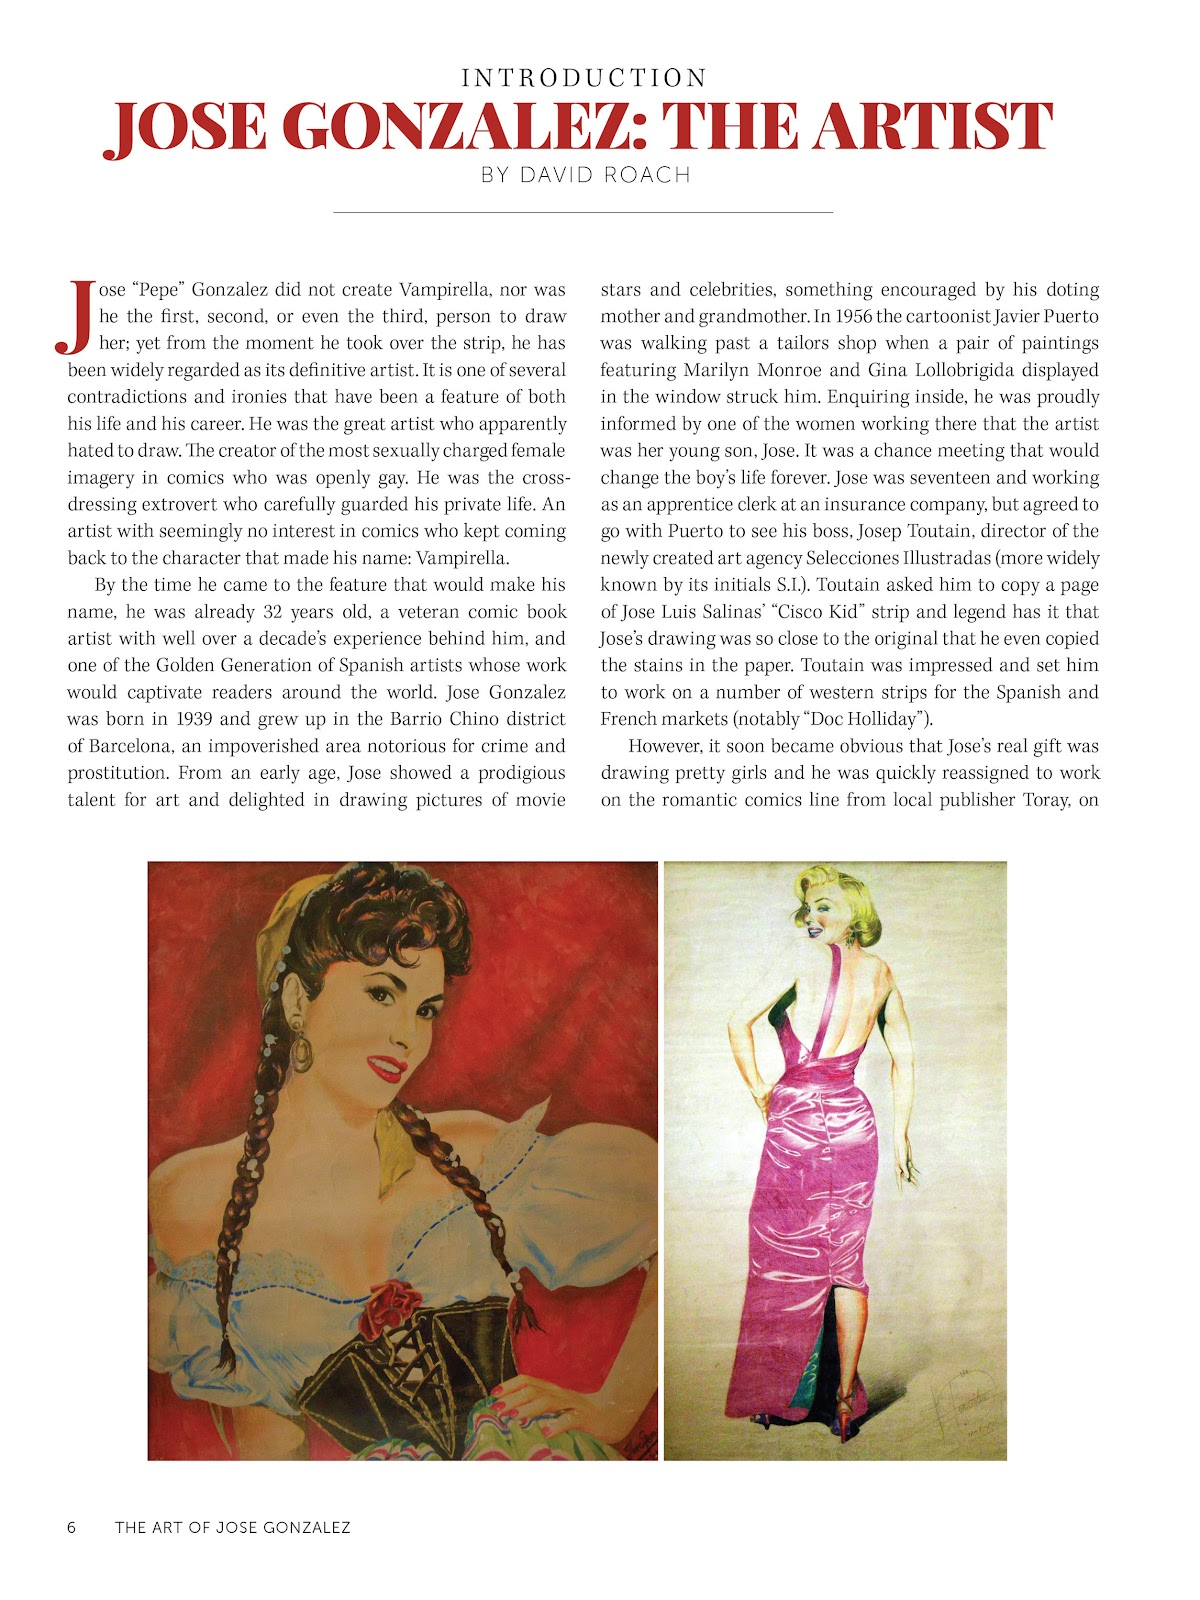 Read online The Art of Jose Gonzalez comic -  Issue # TPB (Part 1) - 7